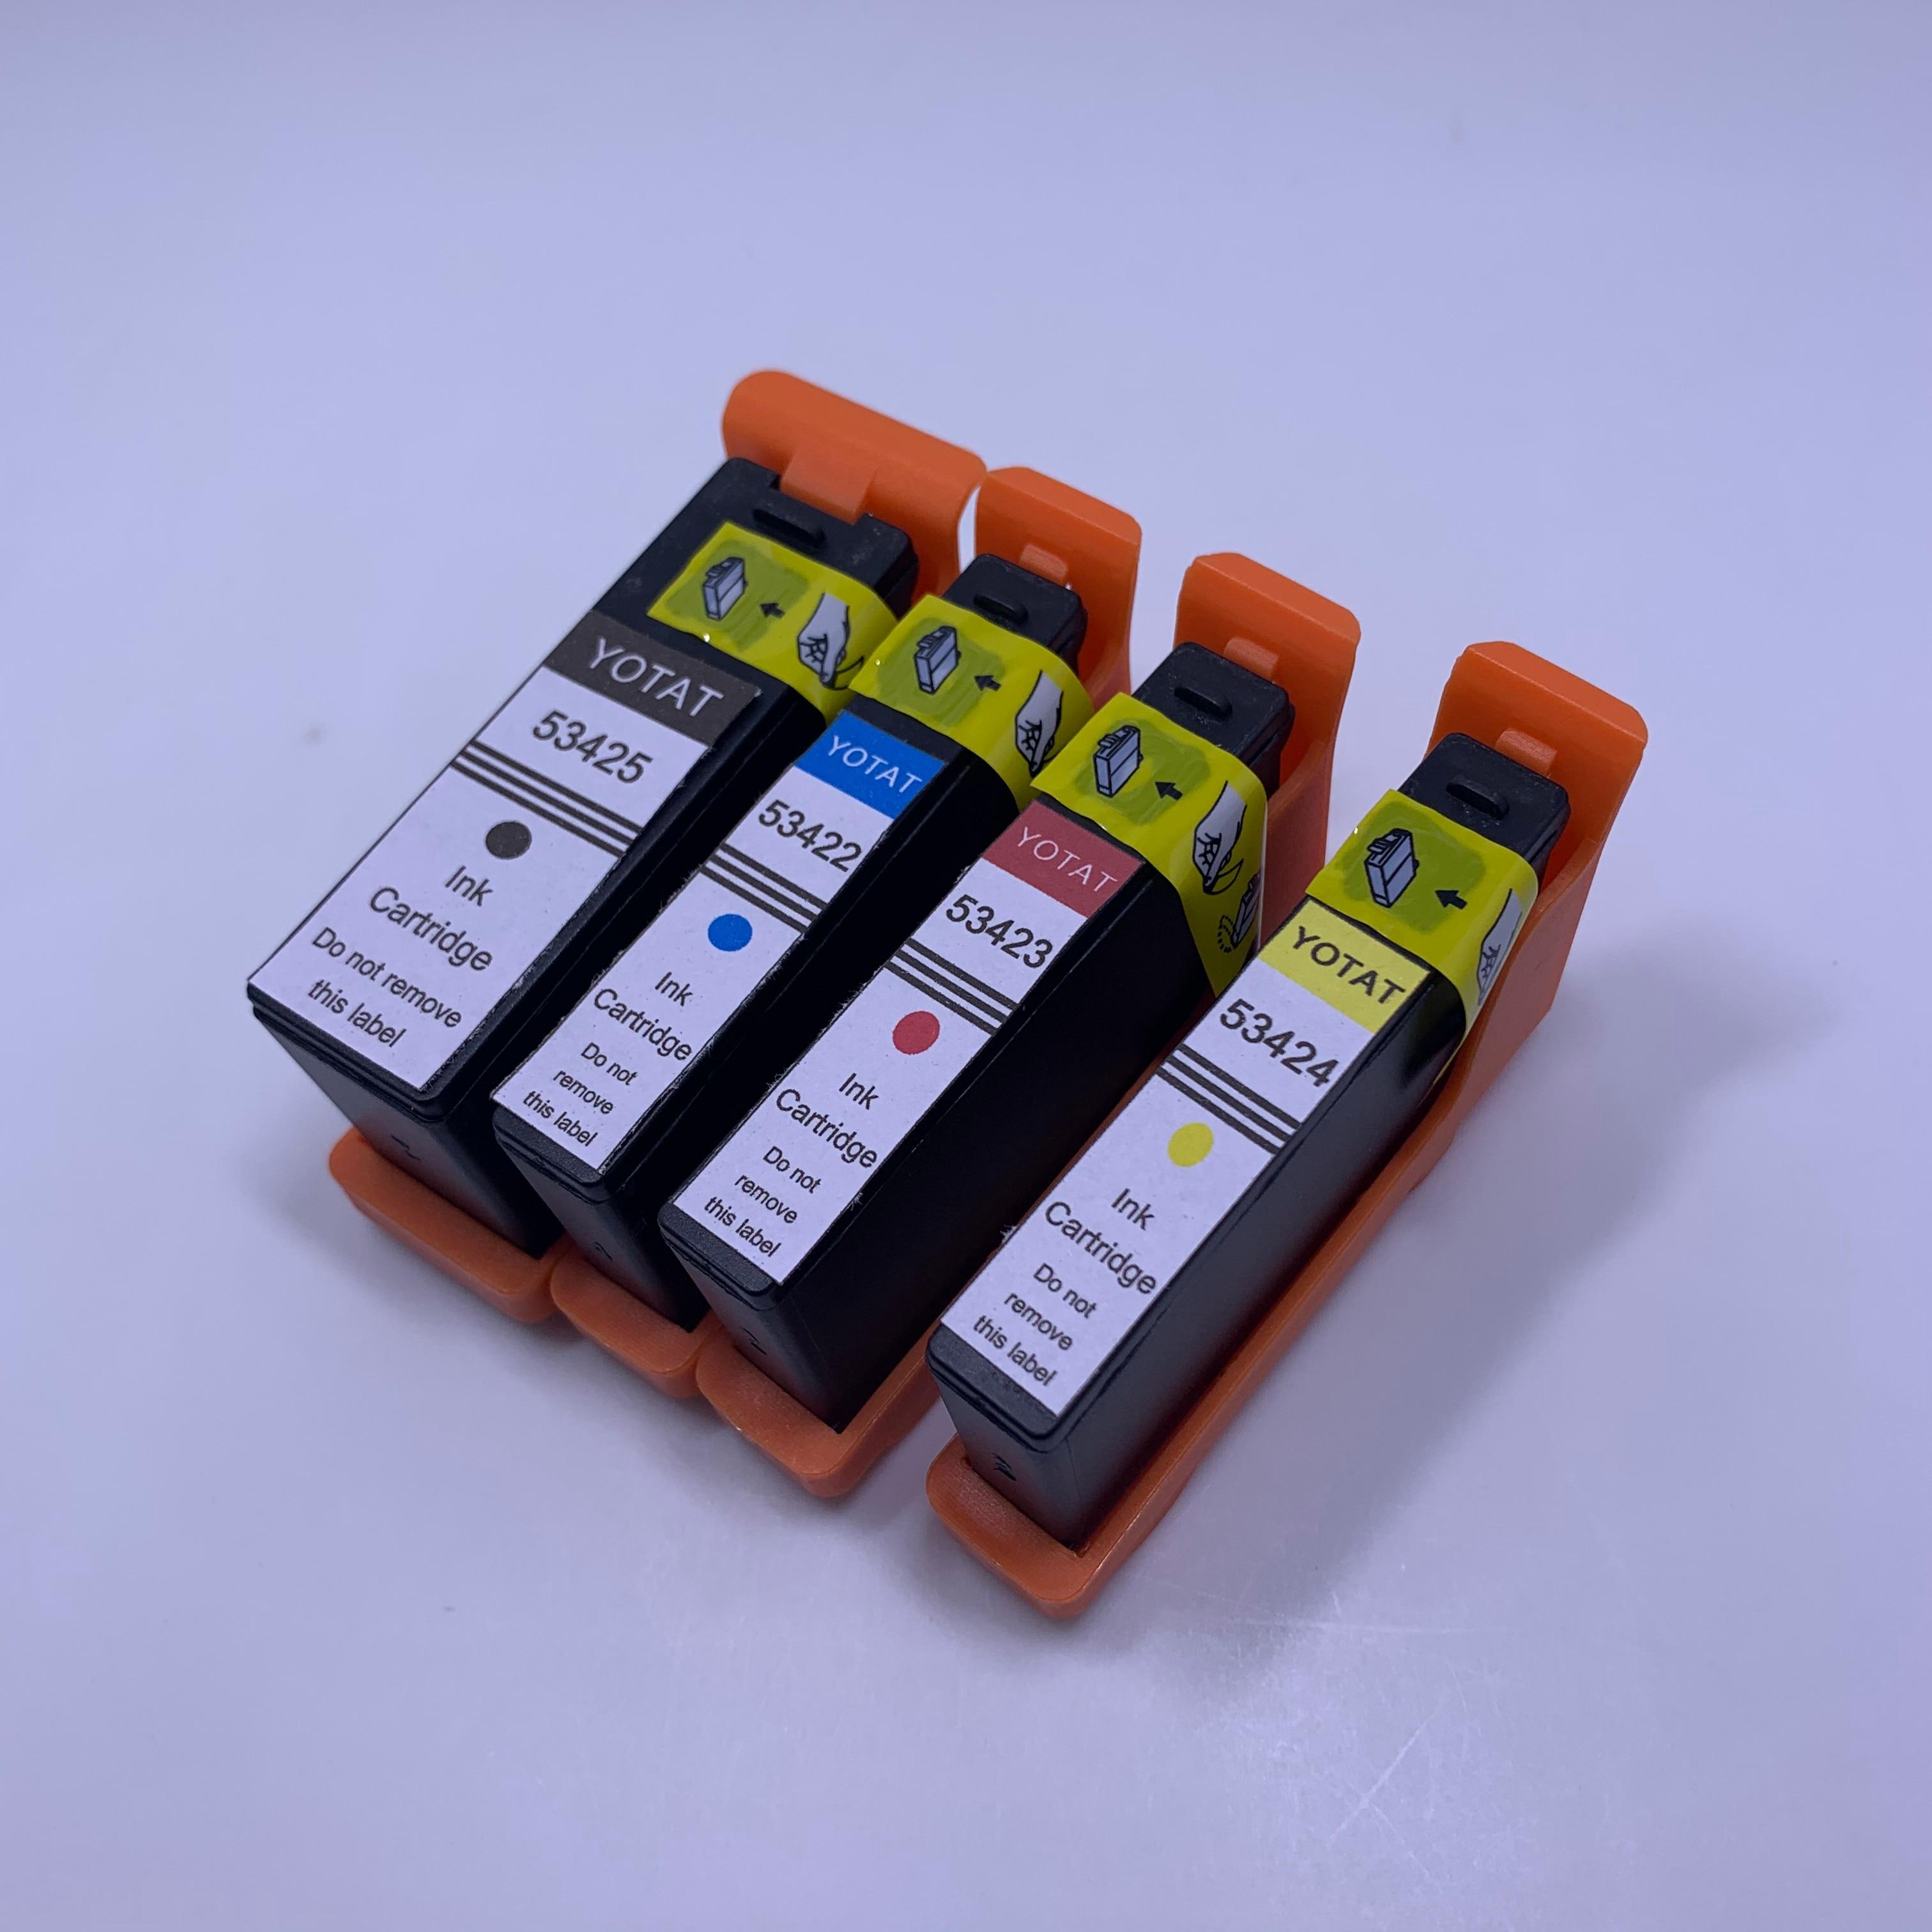 YOTAT 4pcs Compatible For Primera 53425 53422 53423 53424 Ink Cartridge For Primera LX900 Printer